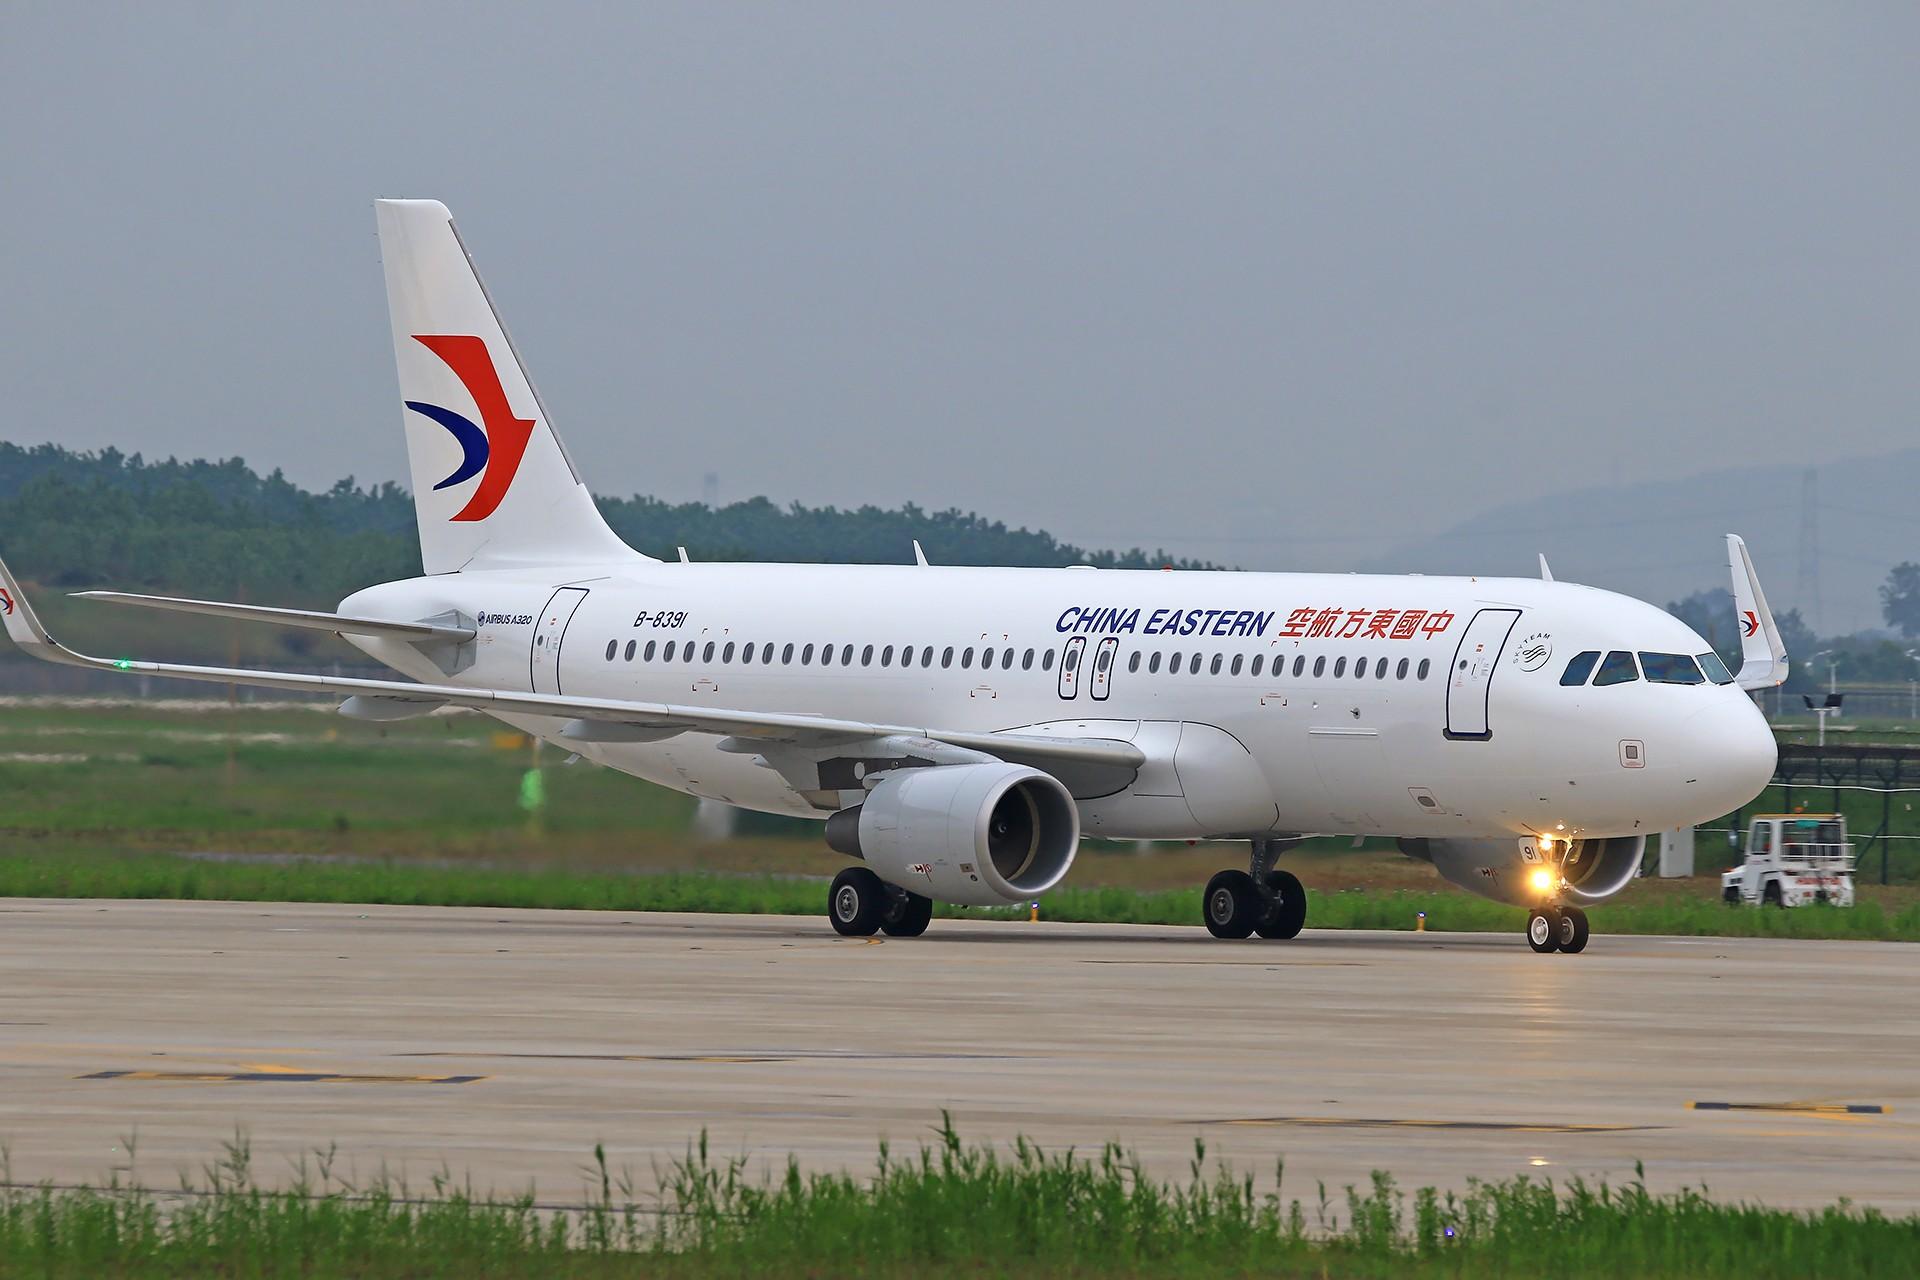 Re:[原创][合肥飞友会]霸都打鸡 找个机会白天打华航 顺便看看期待已久的迪斯尼 AIRBUS A320-200 B-8391 中国合肥新桥国际机场